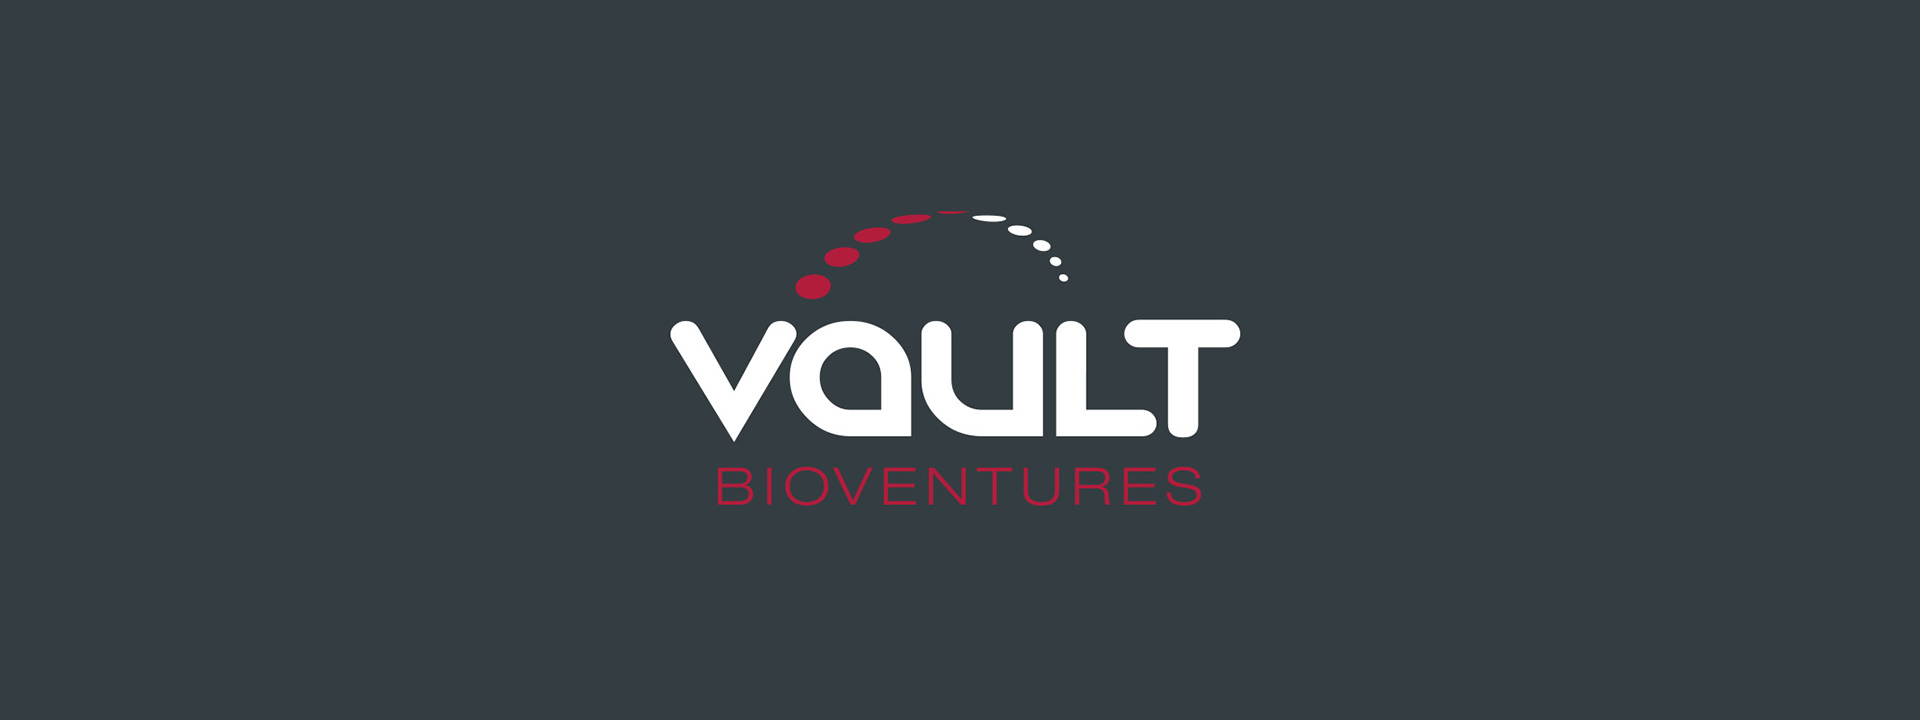 vault bioventures strategy identity design illustration